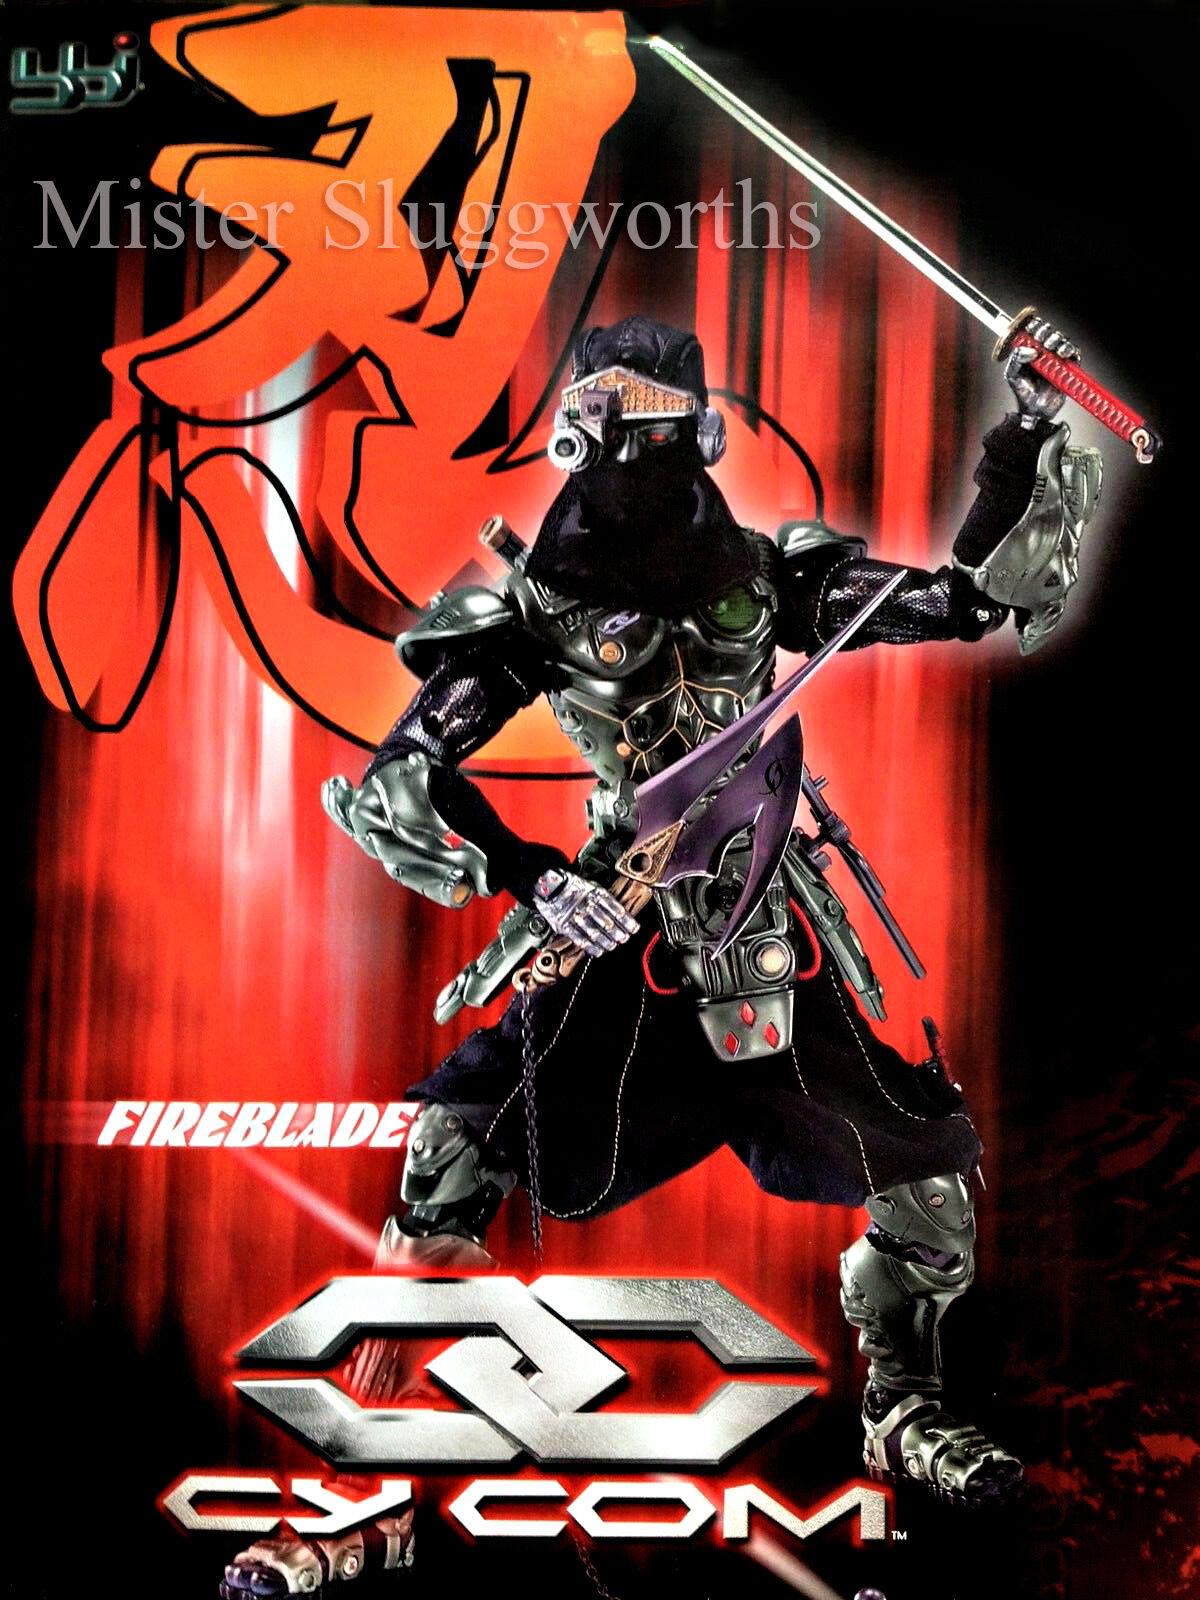 Blau Box BBi 1 6 Cy Com Series Fireblade GI Joe Henshin Ninja Assassin MIB Rare